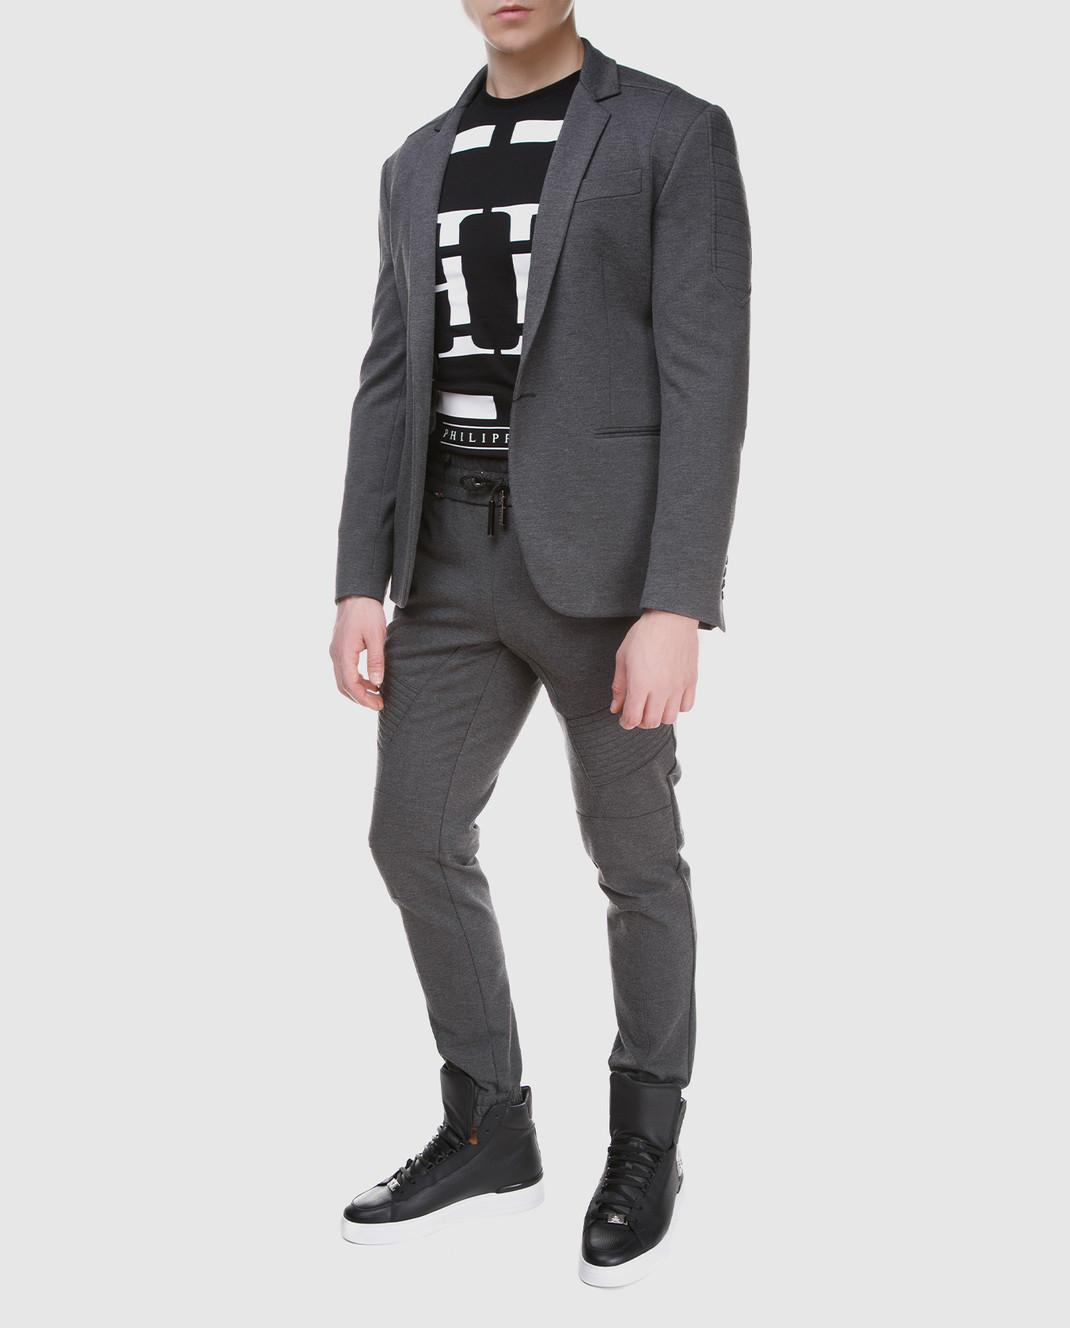 Philipp Plein Серый пиджак MRF0323 изображение 2